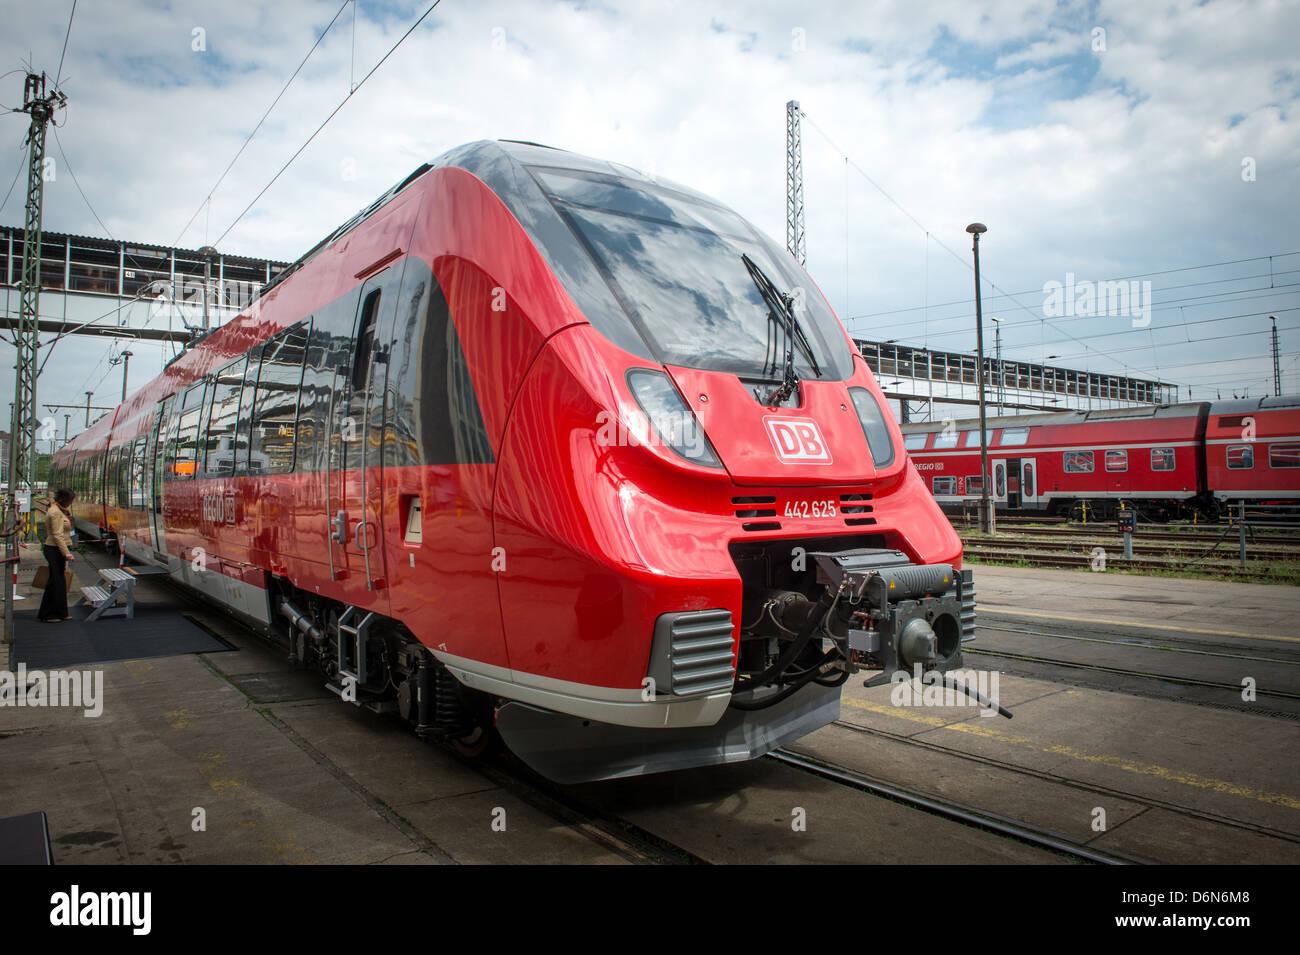 Berlin, Germany, presentation of the new TALENT 2 trains of Deutsche Bahn - Stock Image